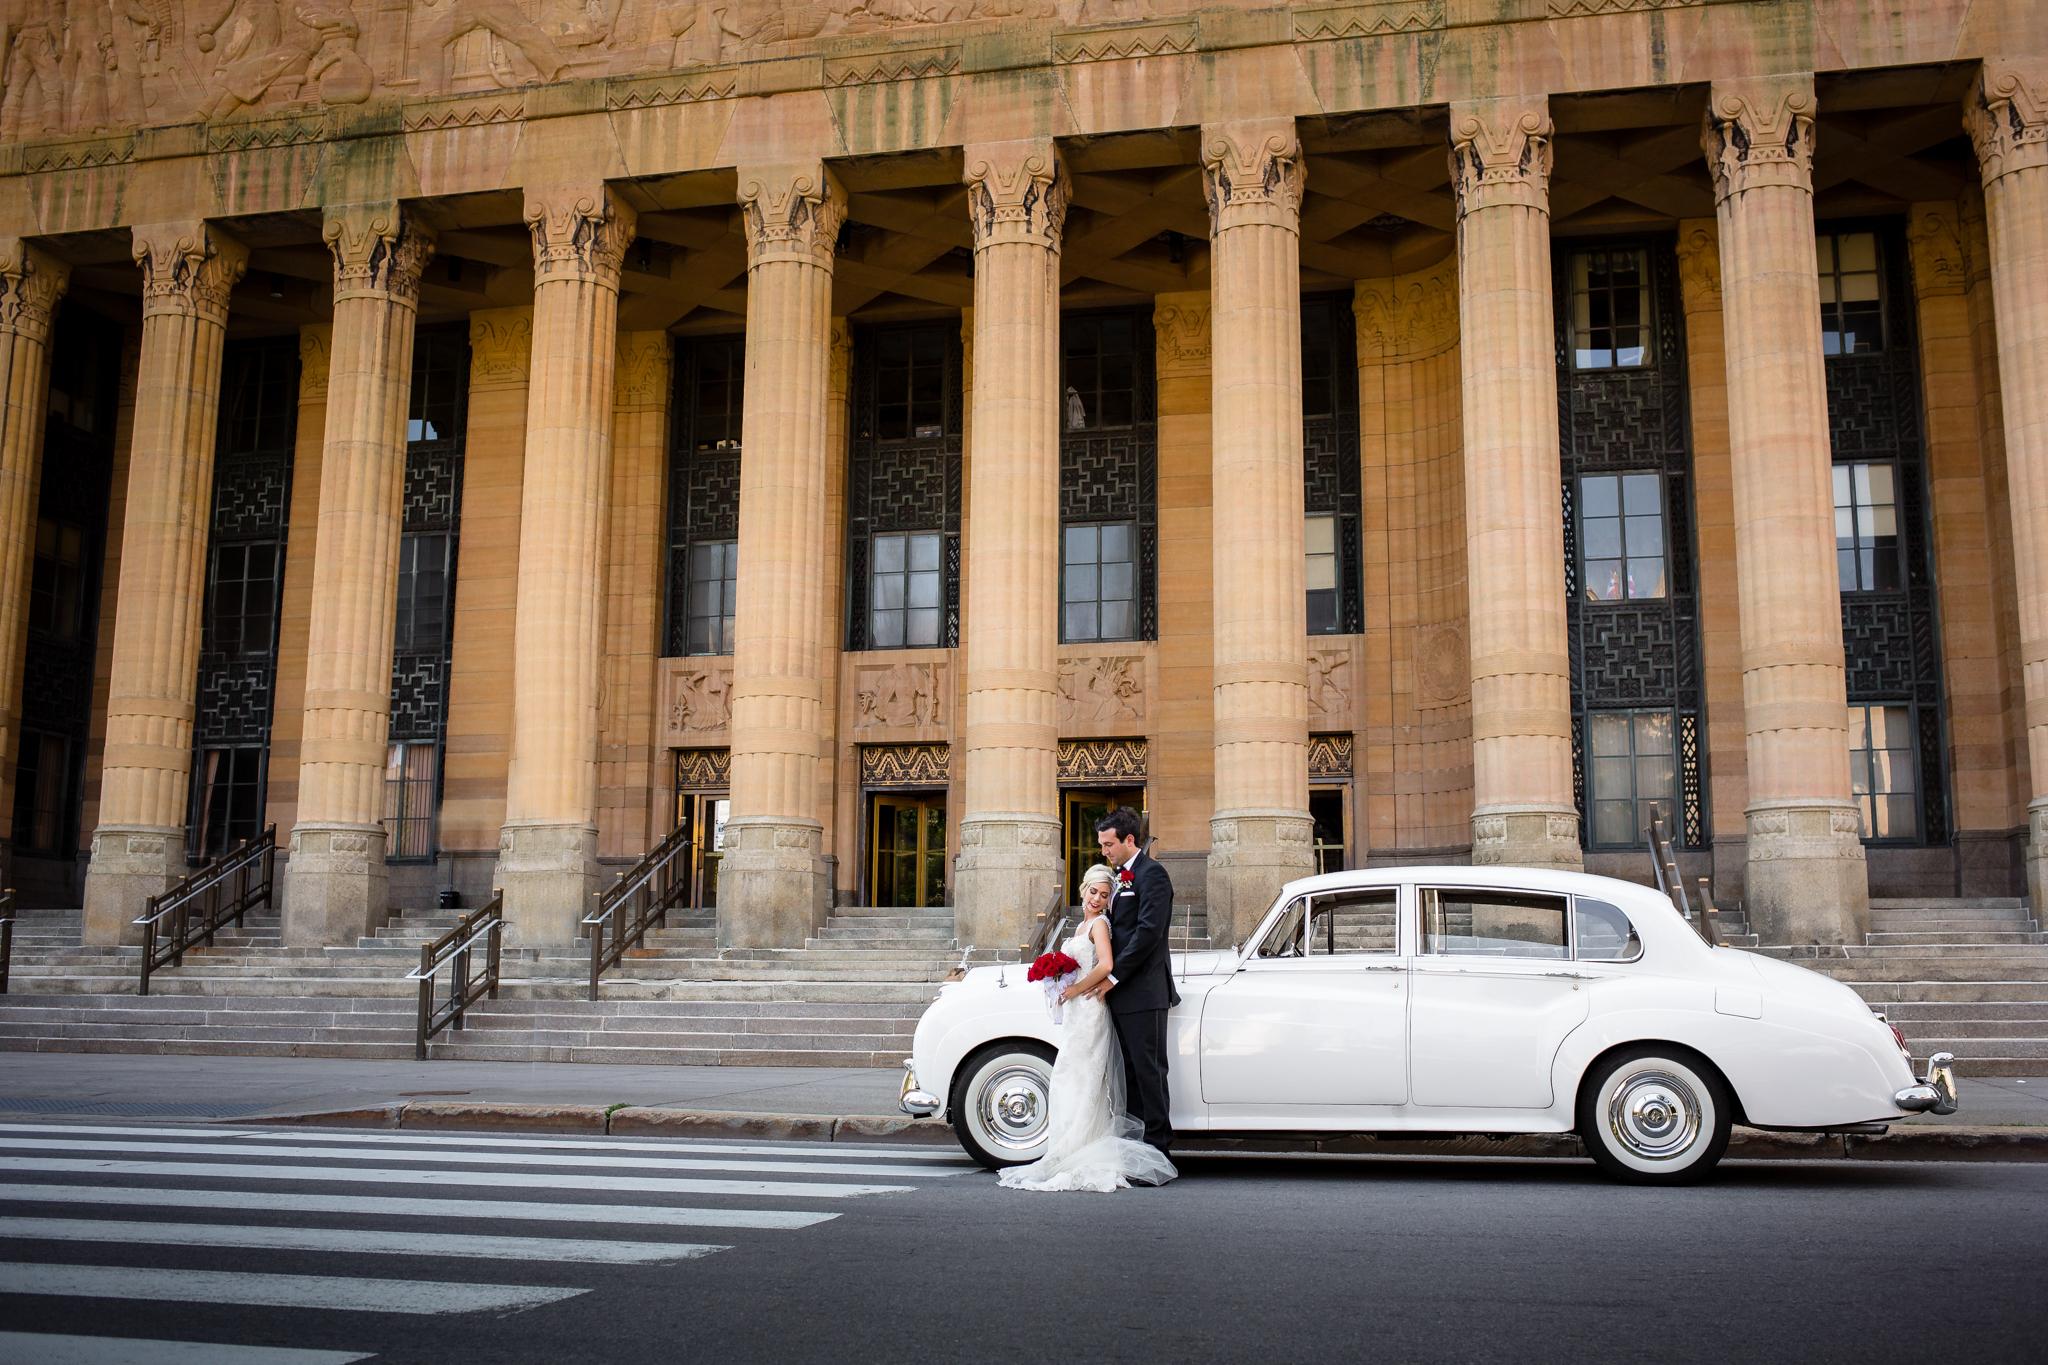 Statler-City-Buffalo-wedding-photographer- 0330.jpg